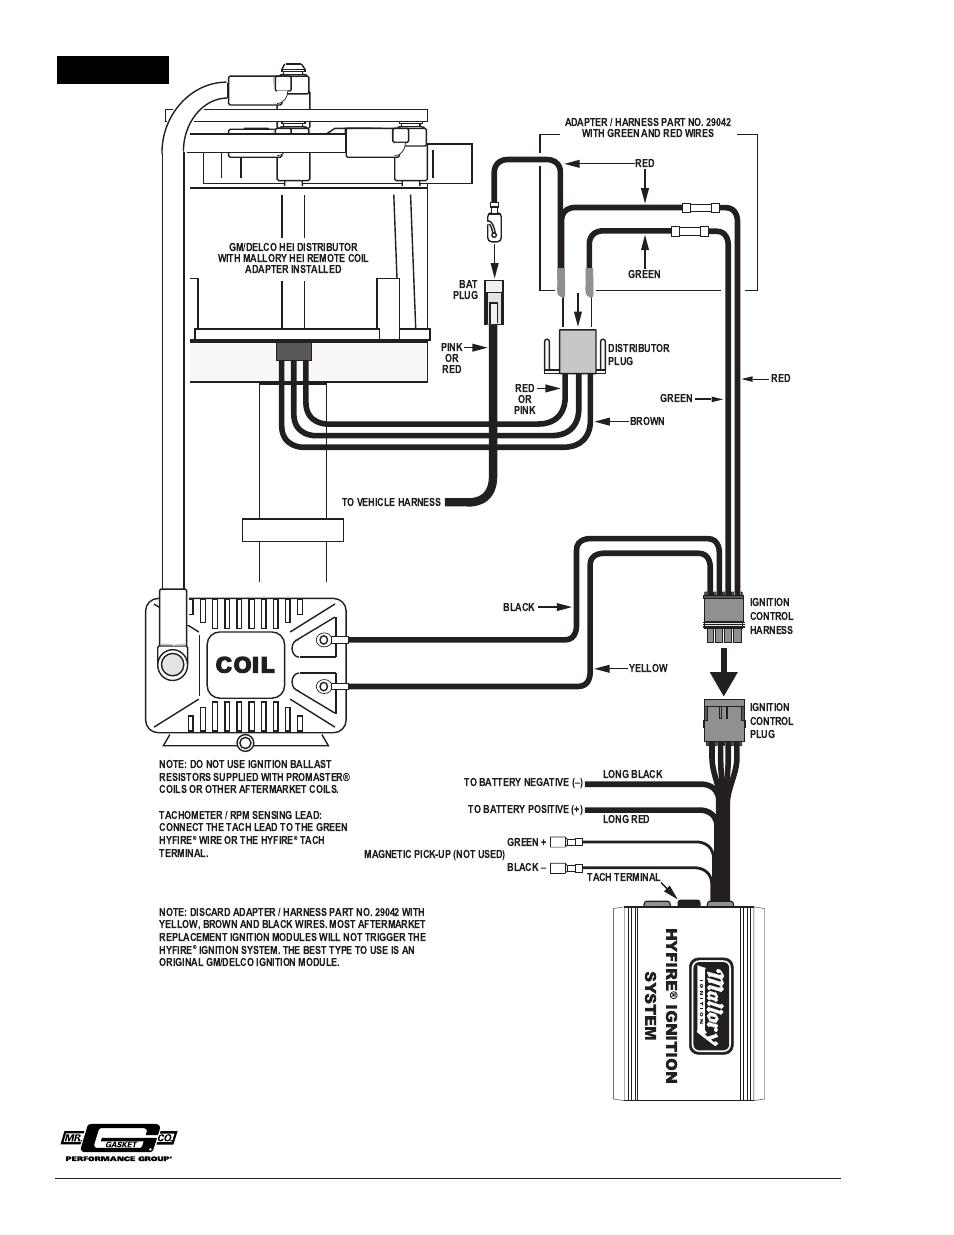 Mallory Ylm Av Wiring Diagram on